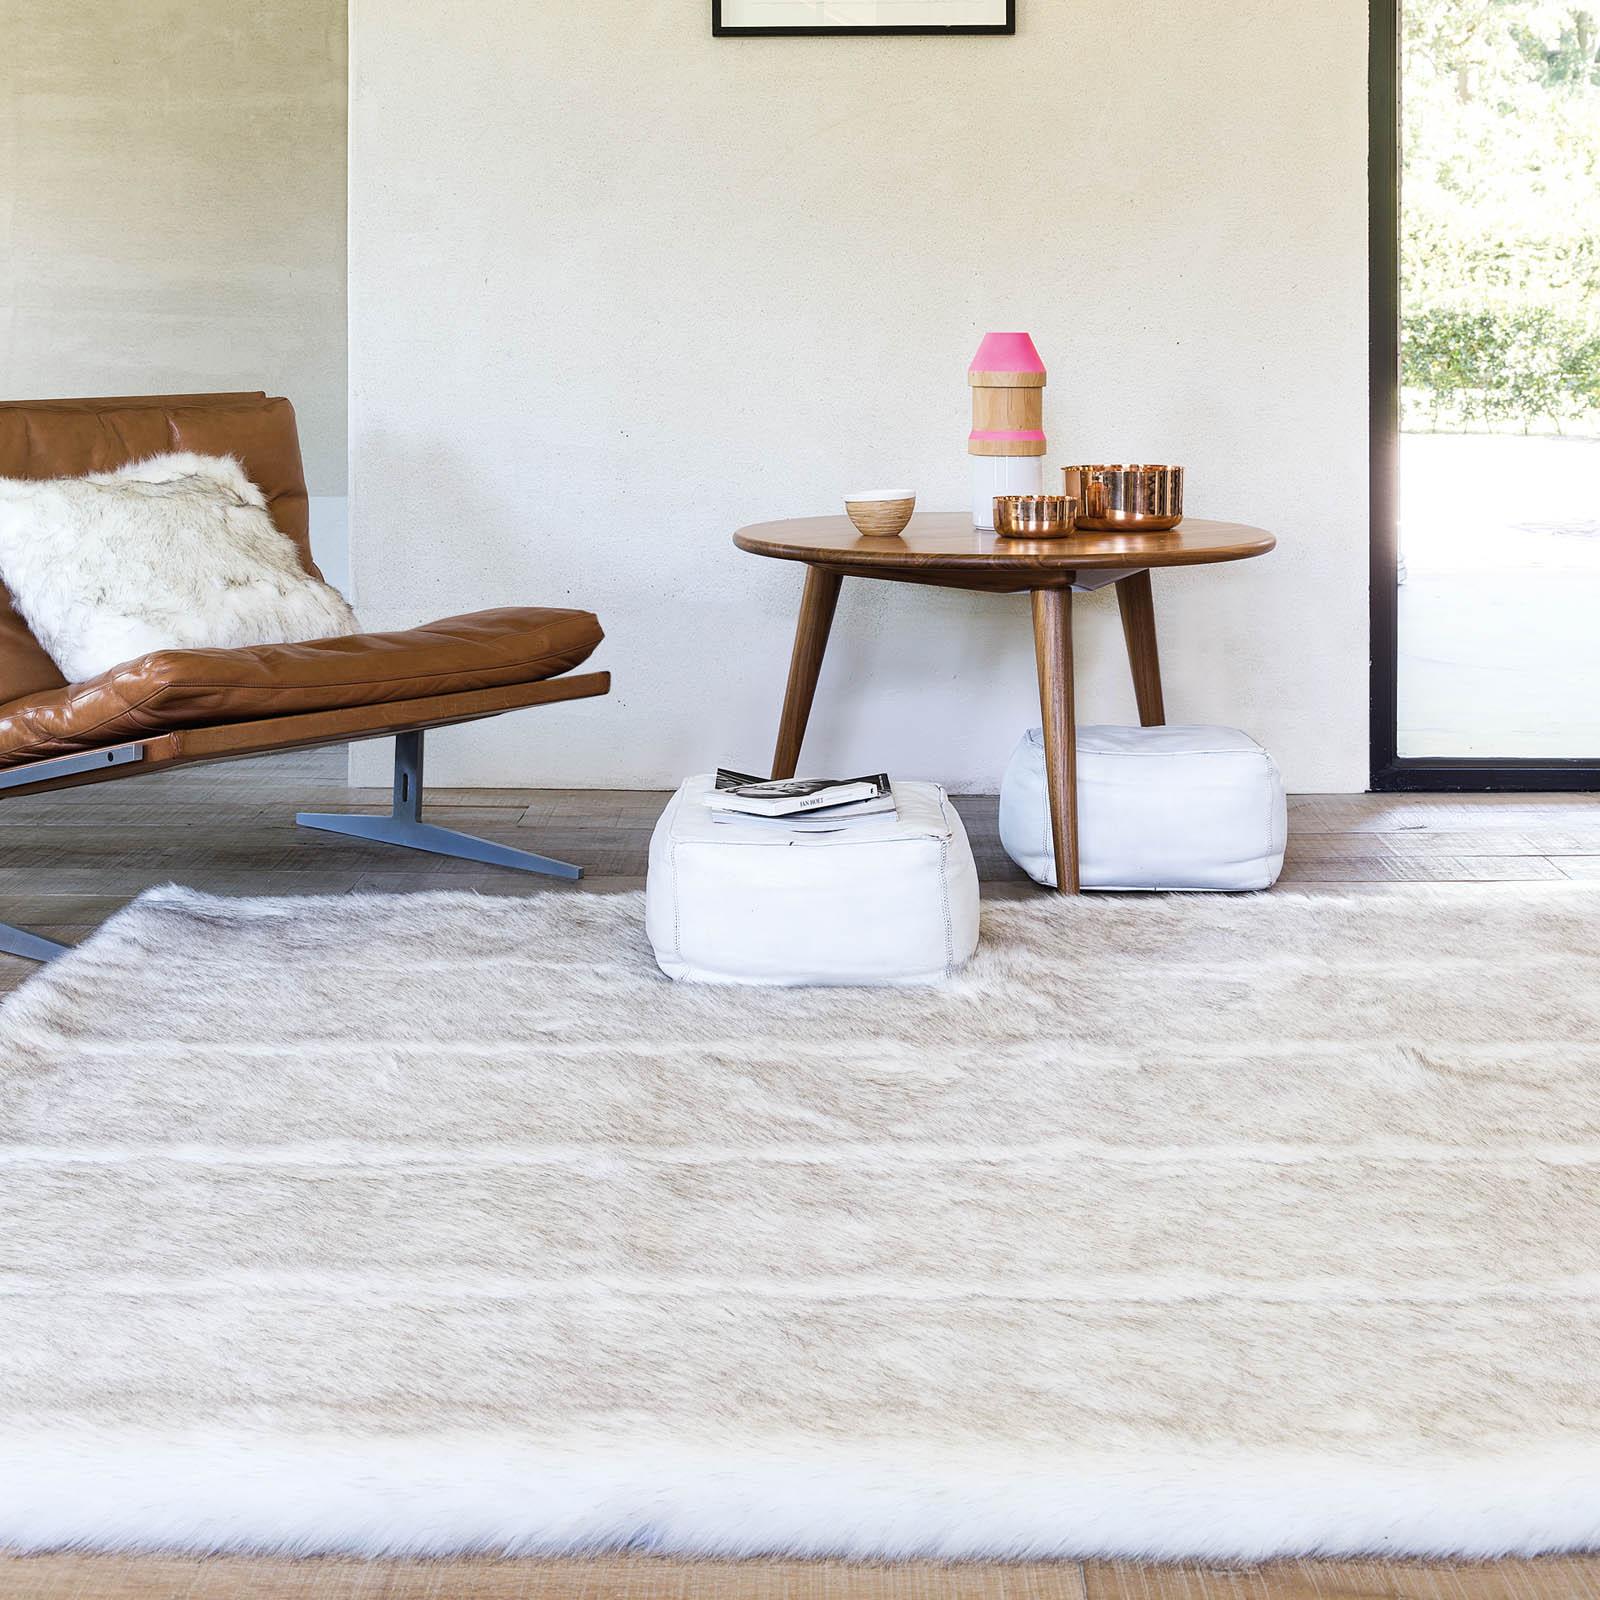 pelle feel rugs in cream and beige    by ligne pure  - pelle feel rugs in cream and beige    by ligne pure